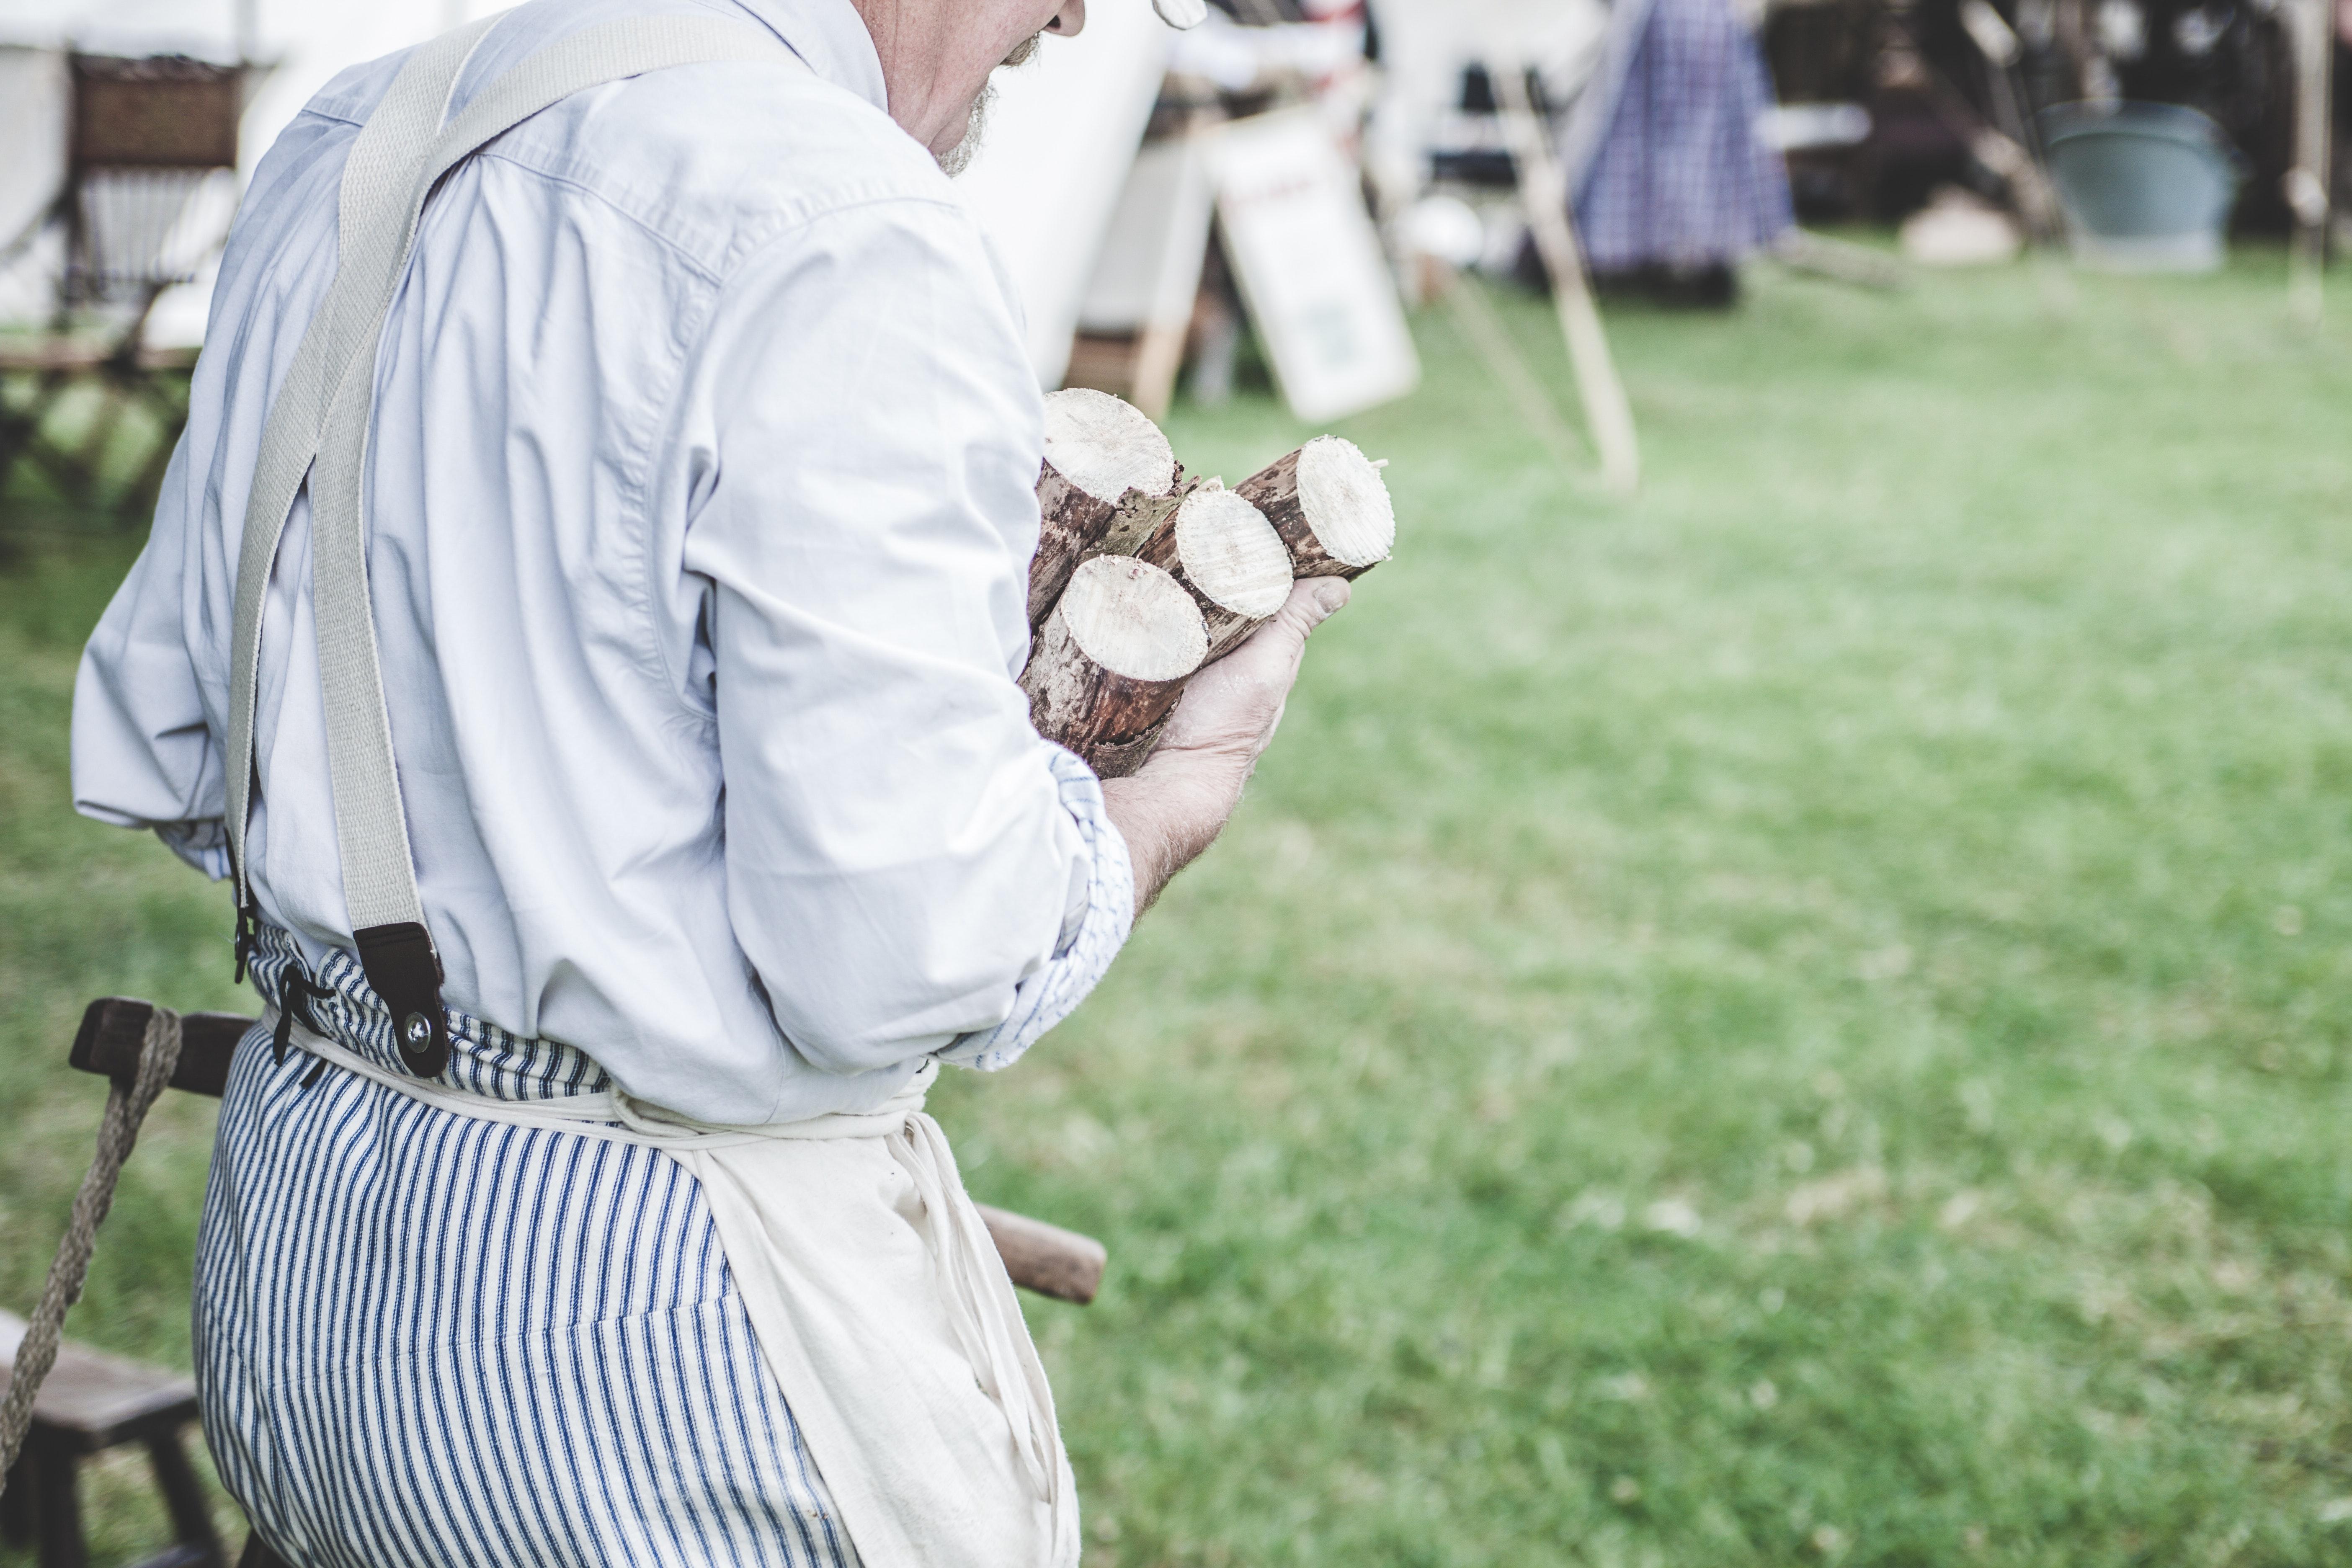 Man in white dress shirt carrying brown wood logs photo